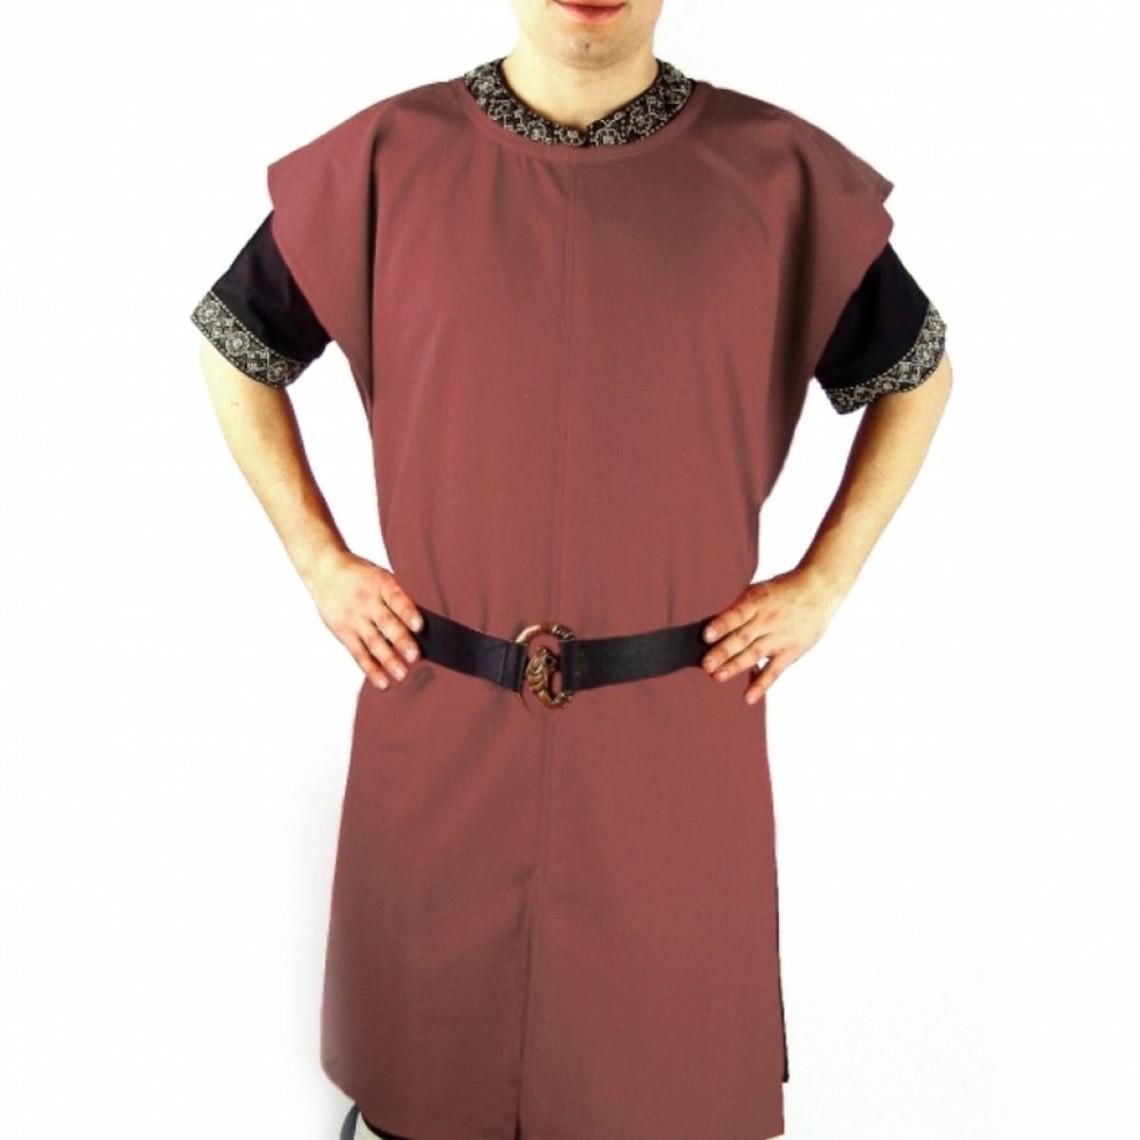 Leonardo Carbone Overkleed heren, donkerbruin